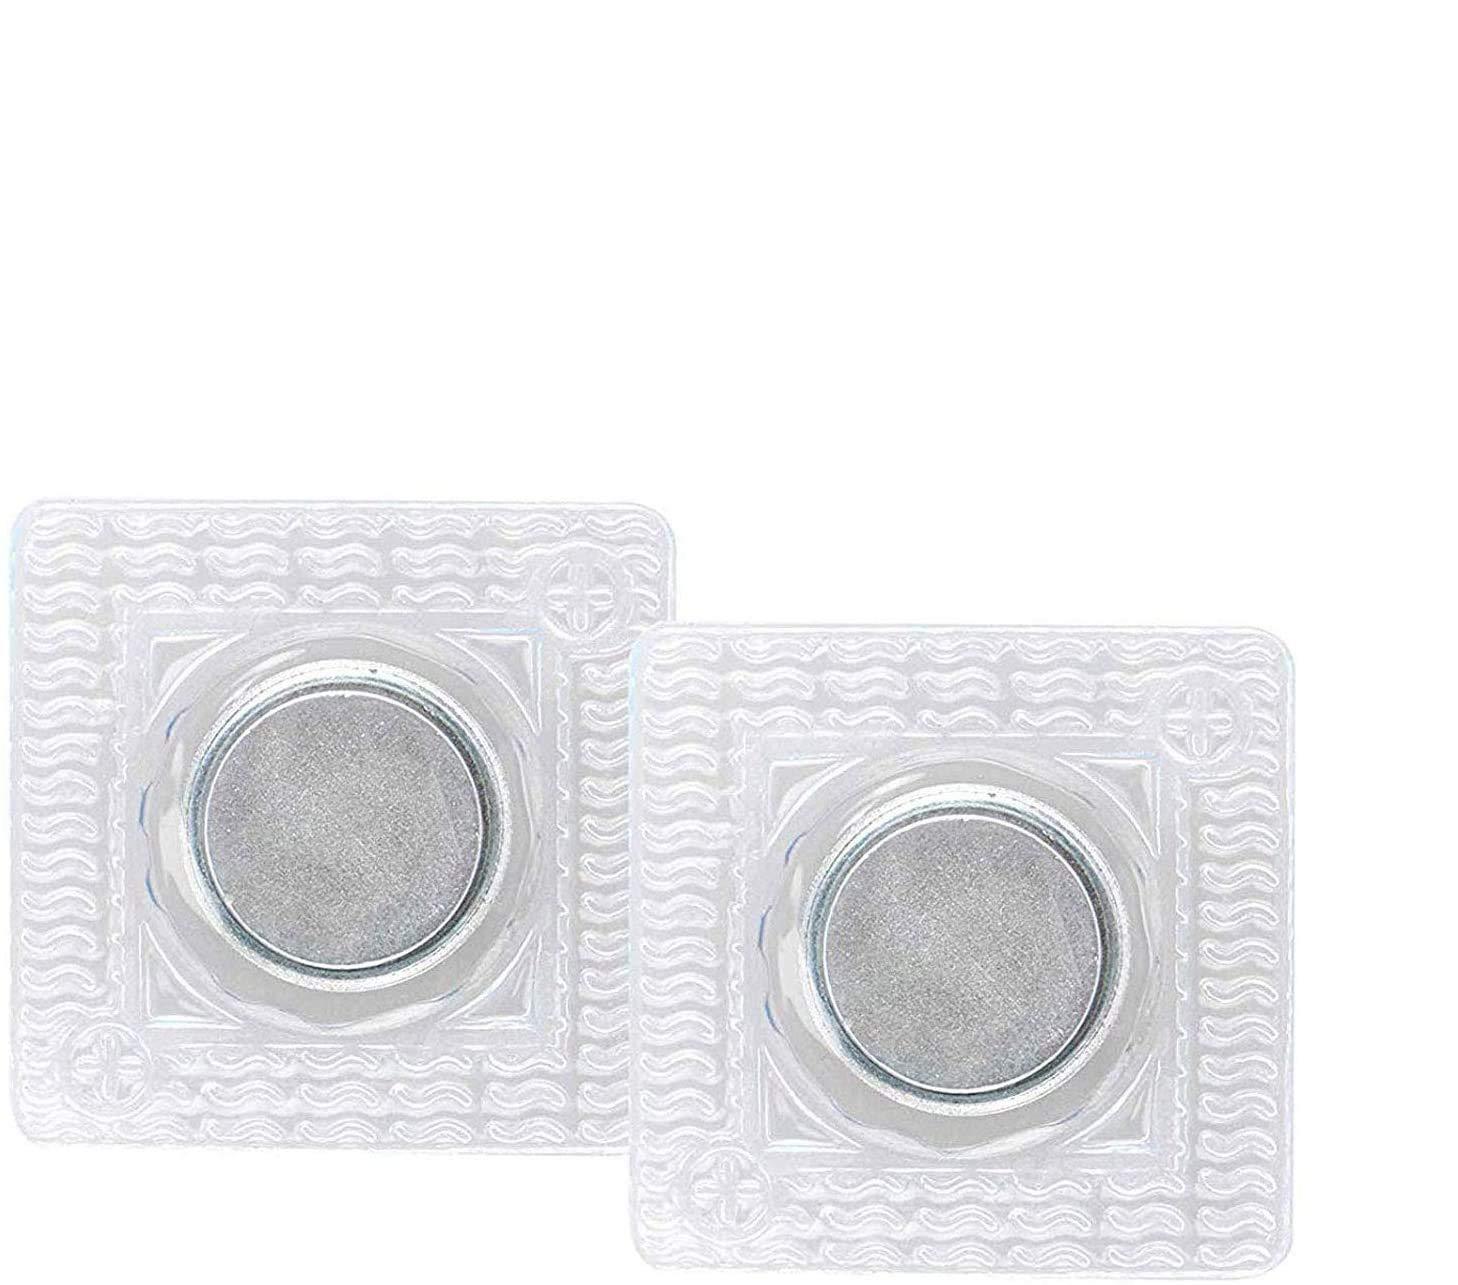 EEEKit Hidden Sew Magnetic Snap, 20 Pairs Invisible Hidden Sew in PVC Hidden Purse Closure Fastener Magnetic Snap Magnet Fastener for Handbag Clothing